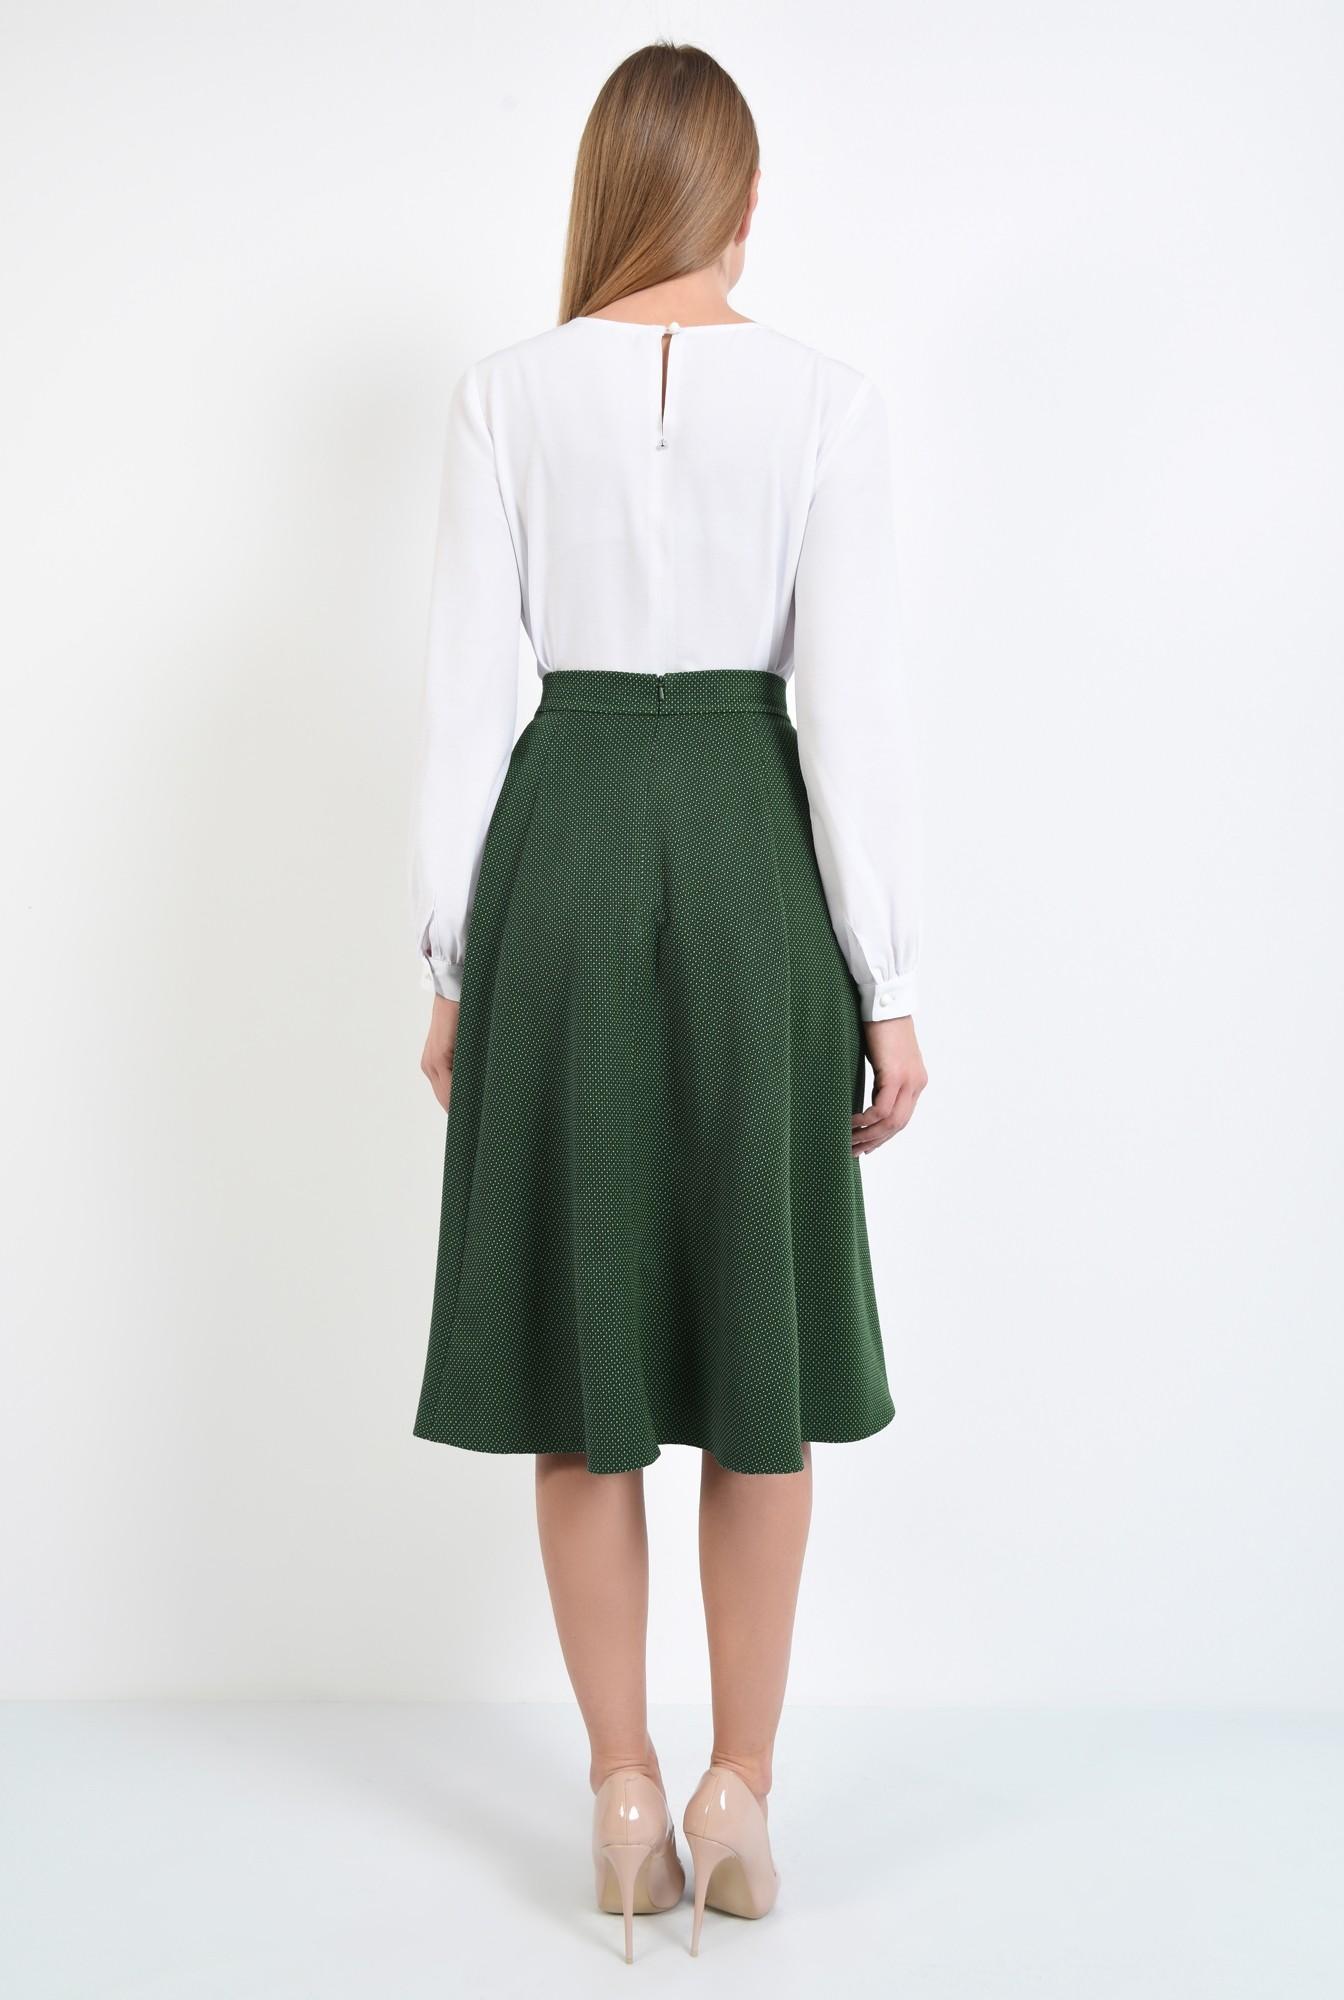 1 - fusta de zi, evazata, verde, cu picouri albe, cu talie inalta